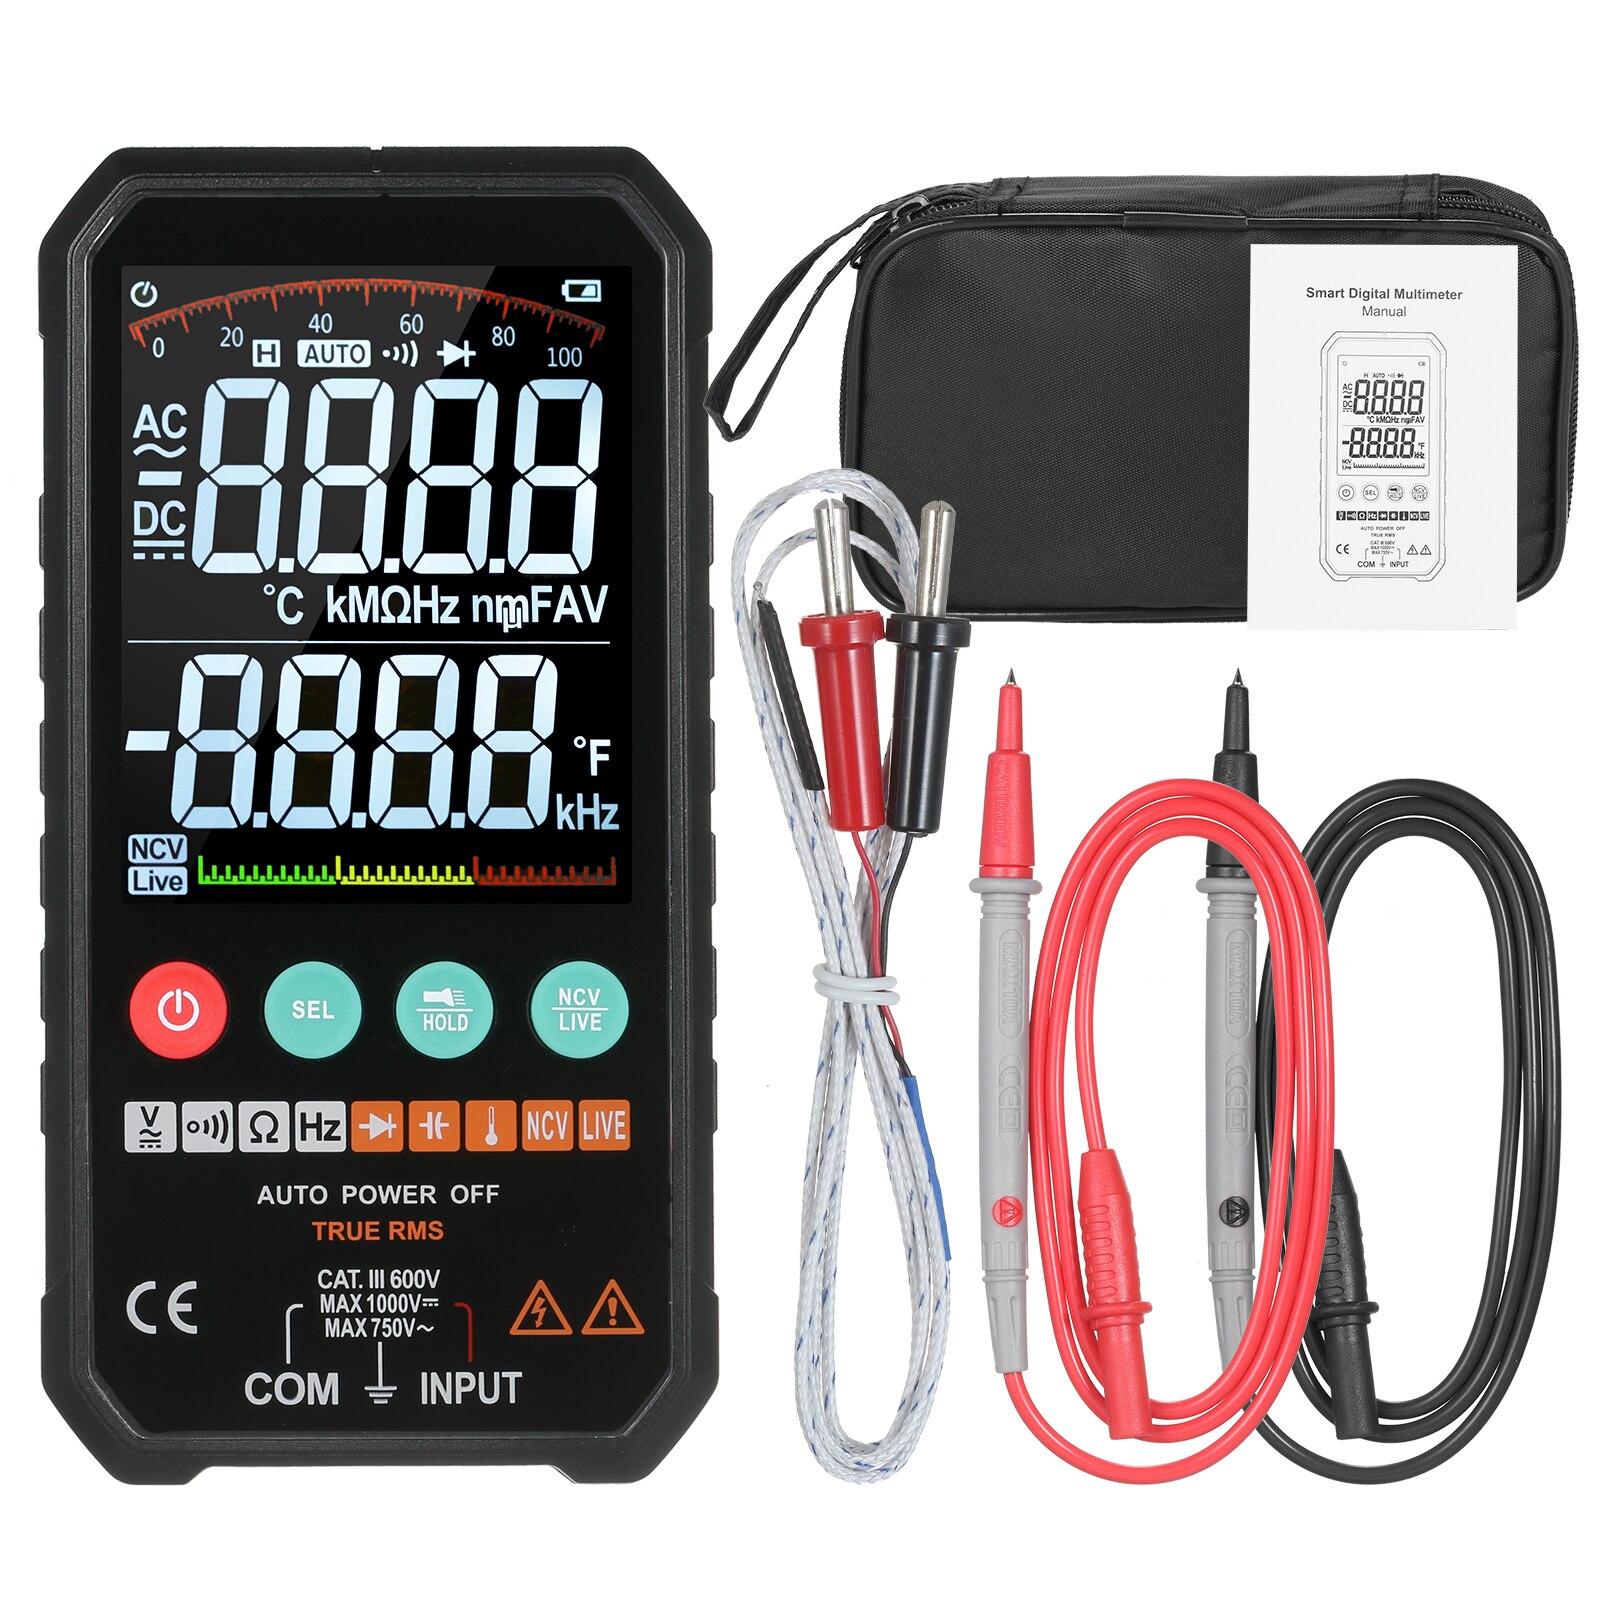 FY107C/FY107B 6000 zählt Digital Multimeter Ture RMS AC DC NCV Transistor Kondensator Temperatur Spannung Smart Meter